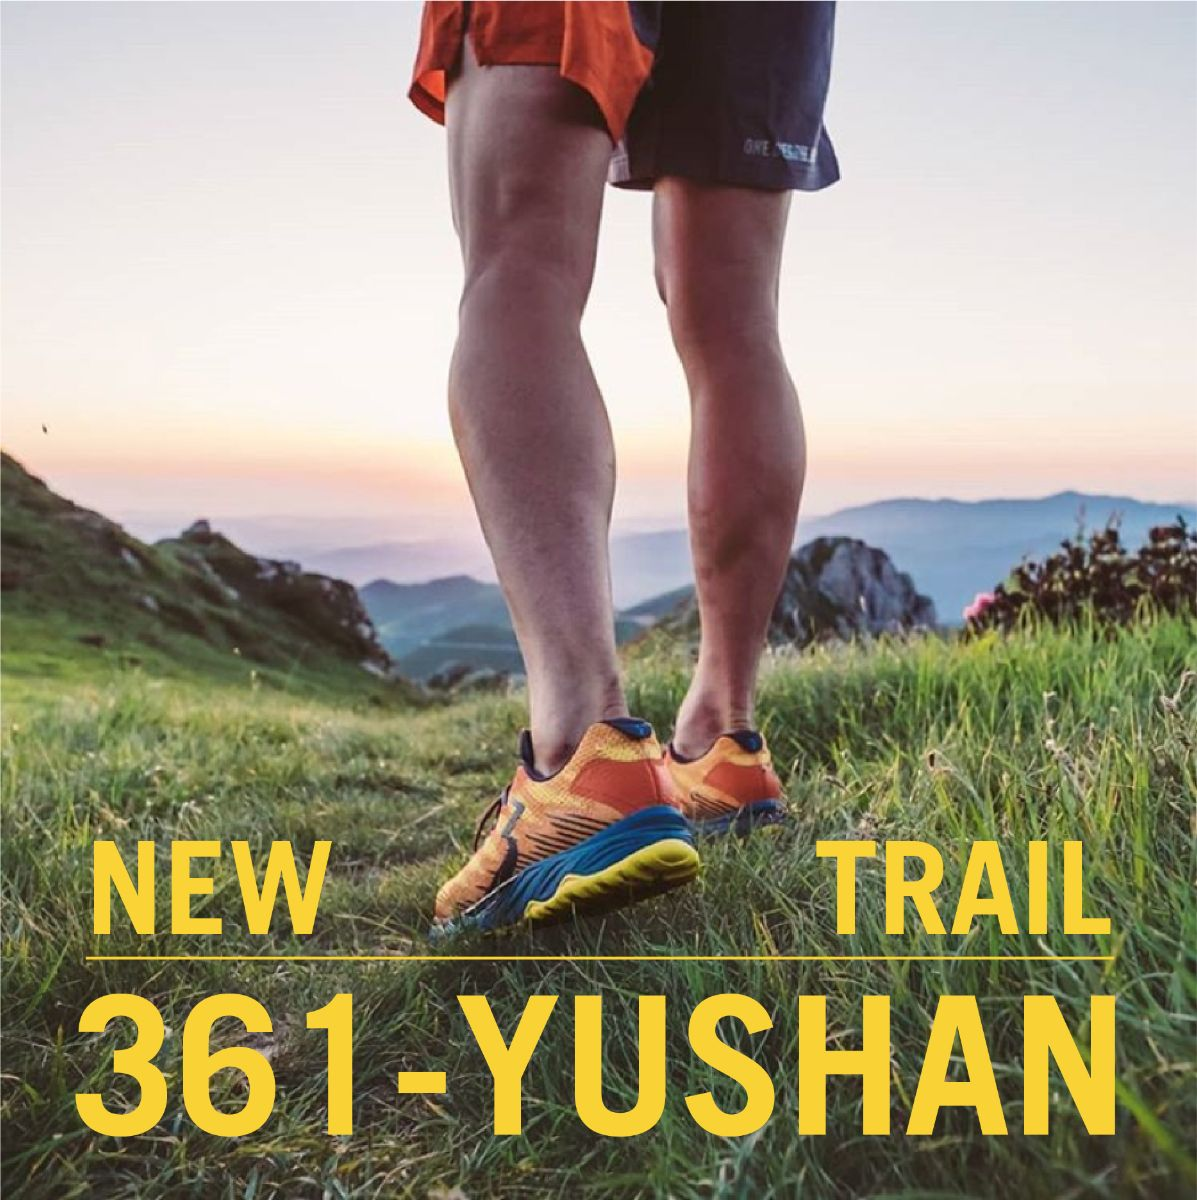 NEW TRAIL > YUSHAN